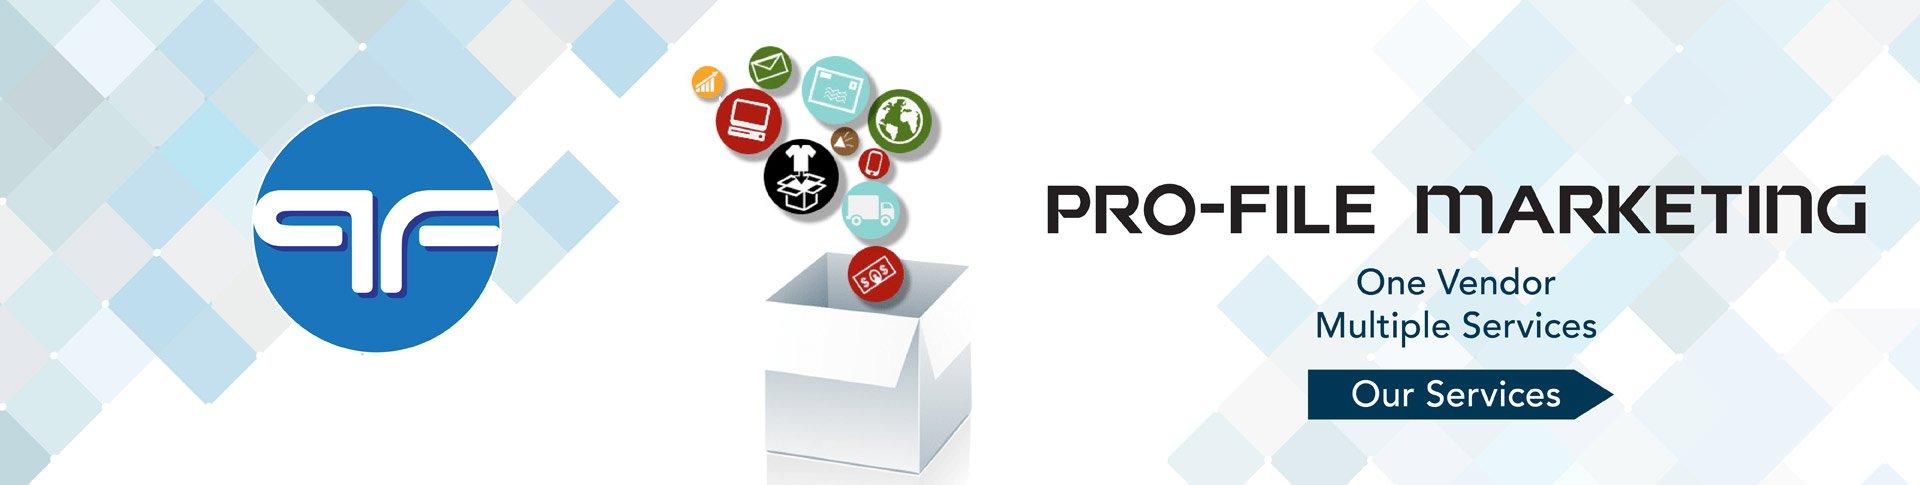 Pro-File Marketing